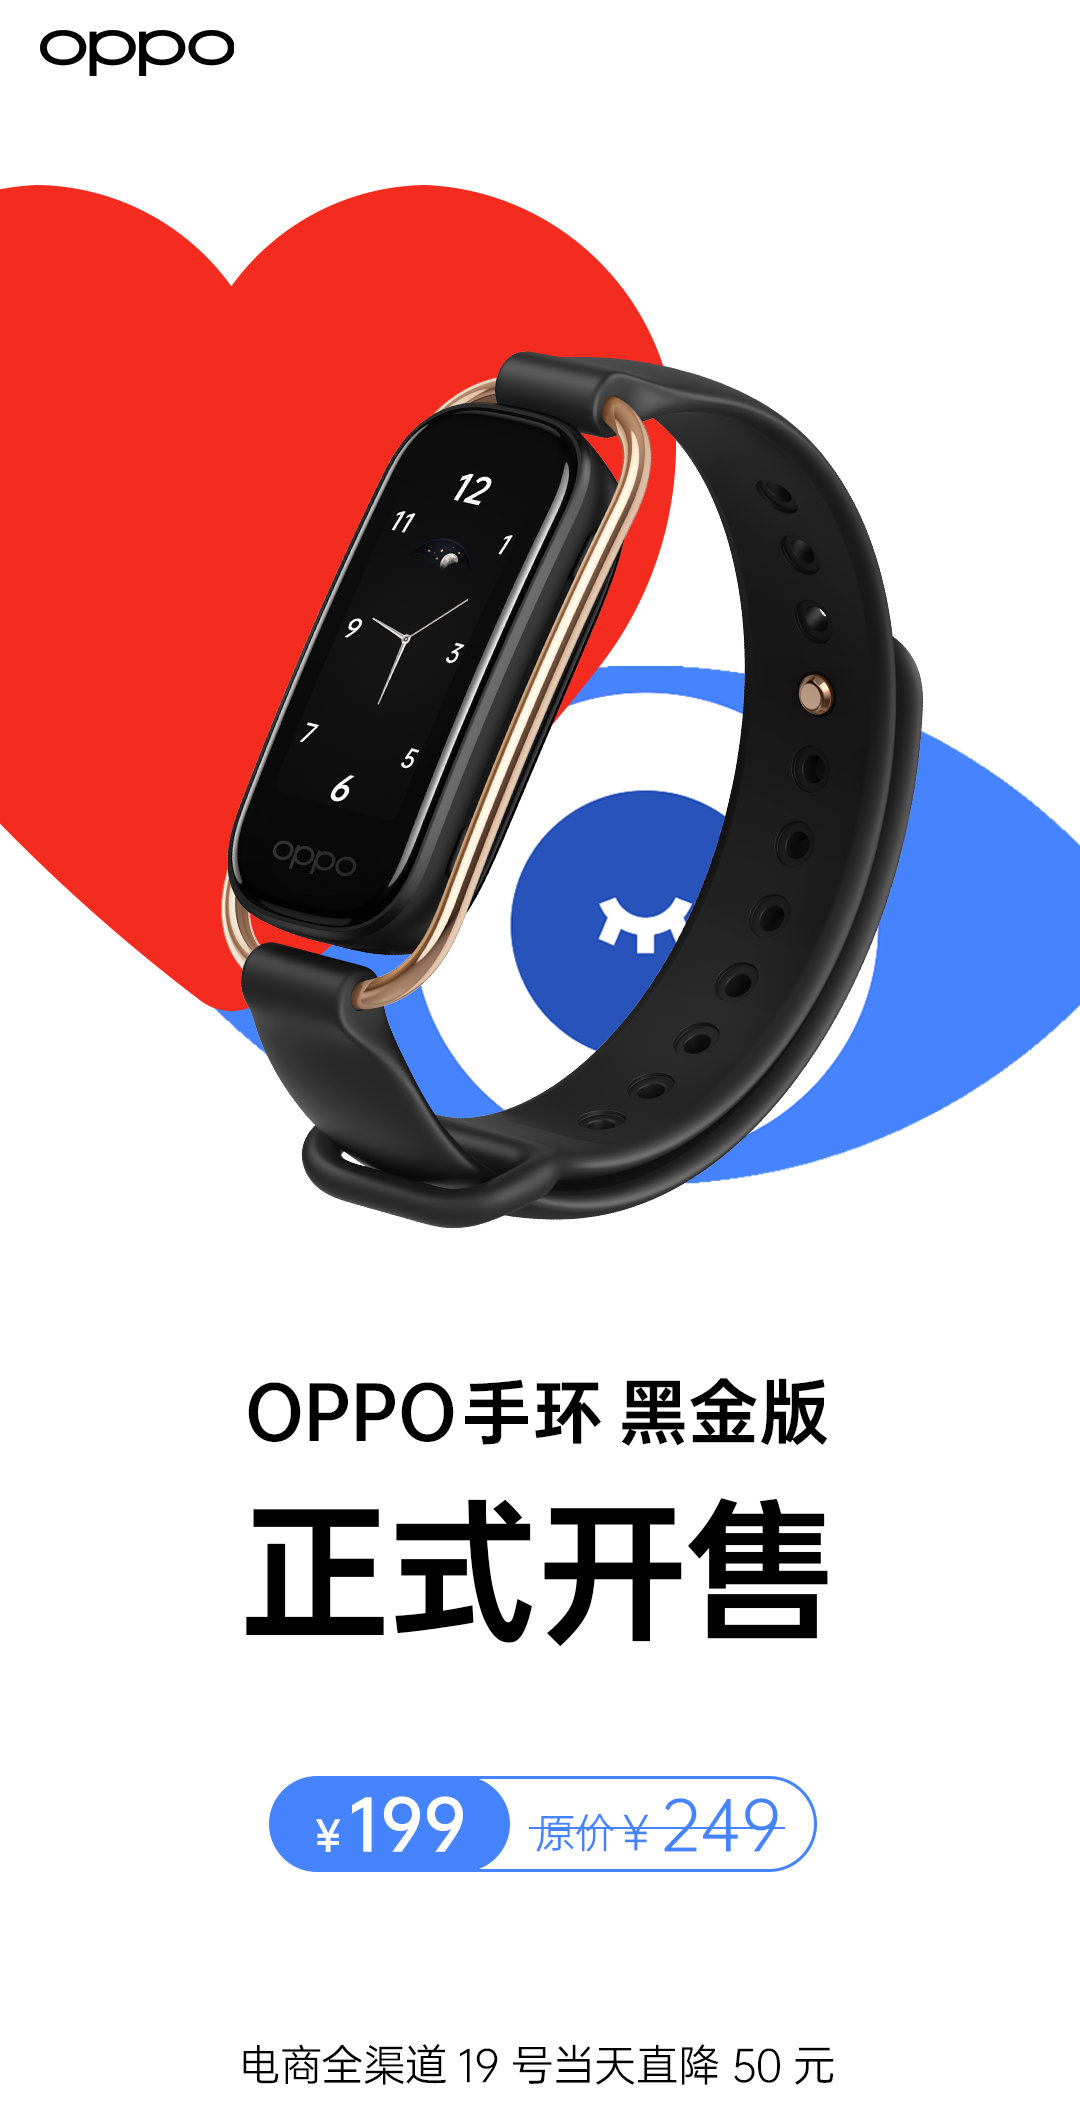 OPPO手环黑金版开售 发限时到手价199元